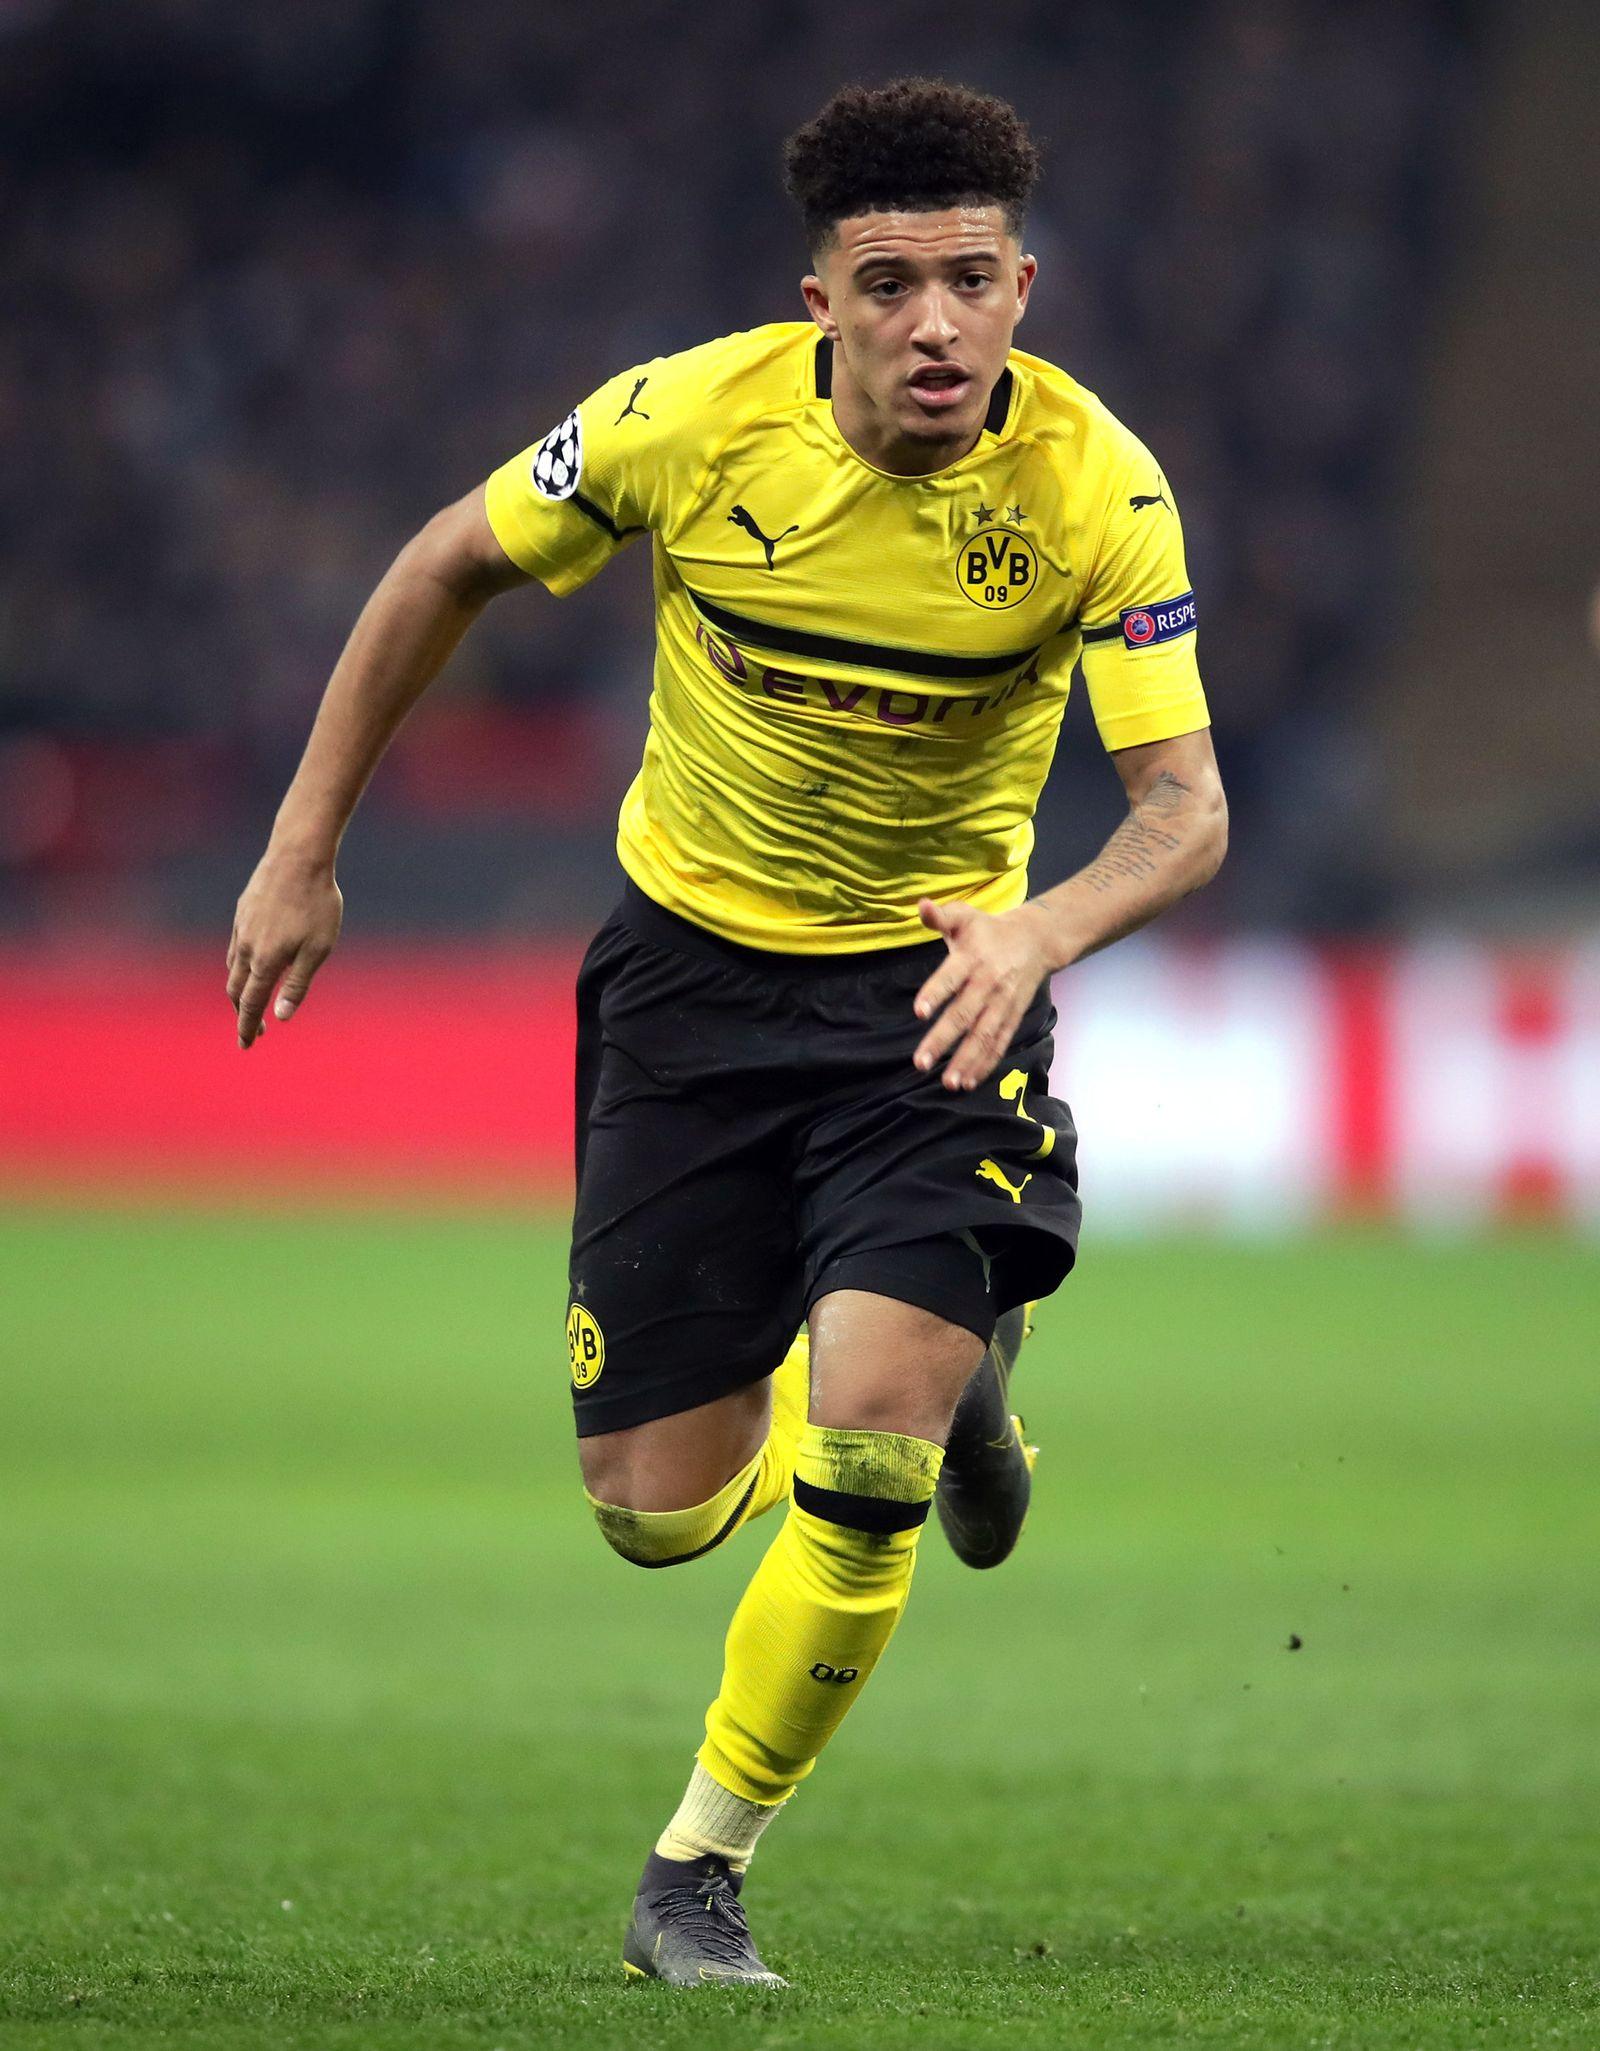 Tottenham Hotspur v Borussia Dortmund - UEFA Champions League - R